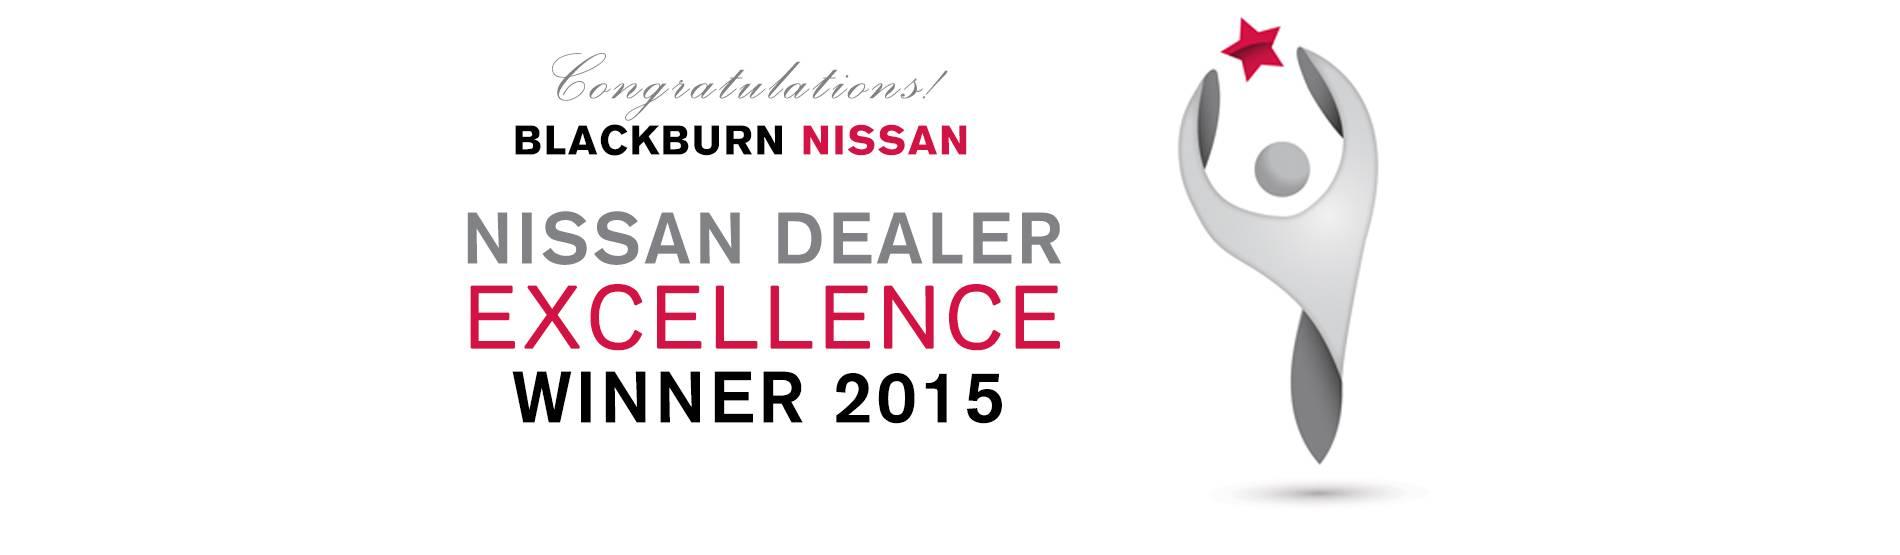 Blackburn Nissan Excellence